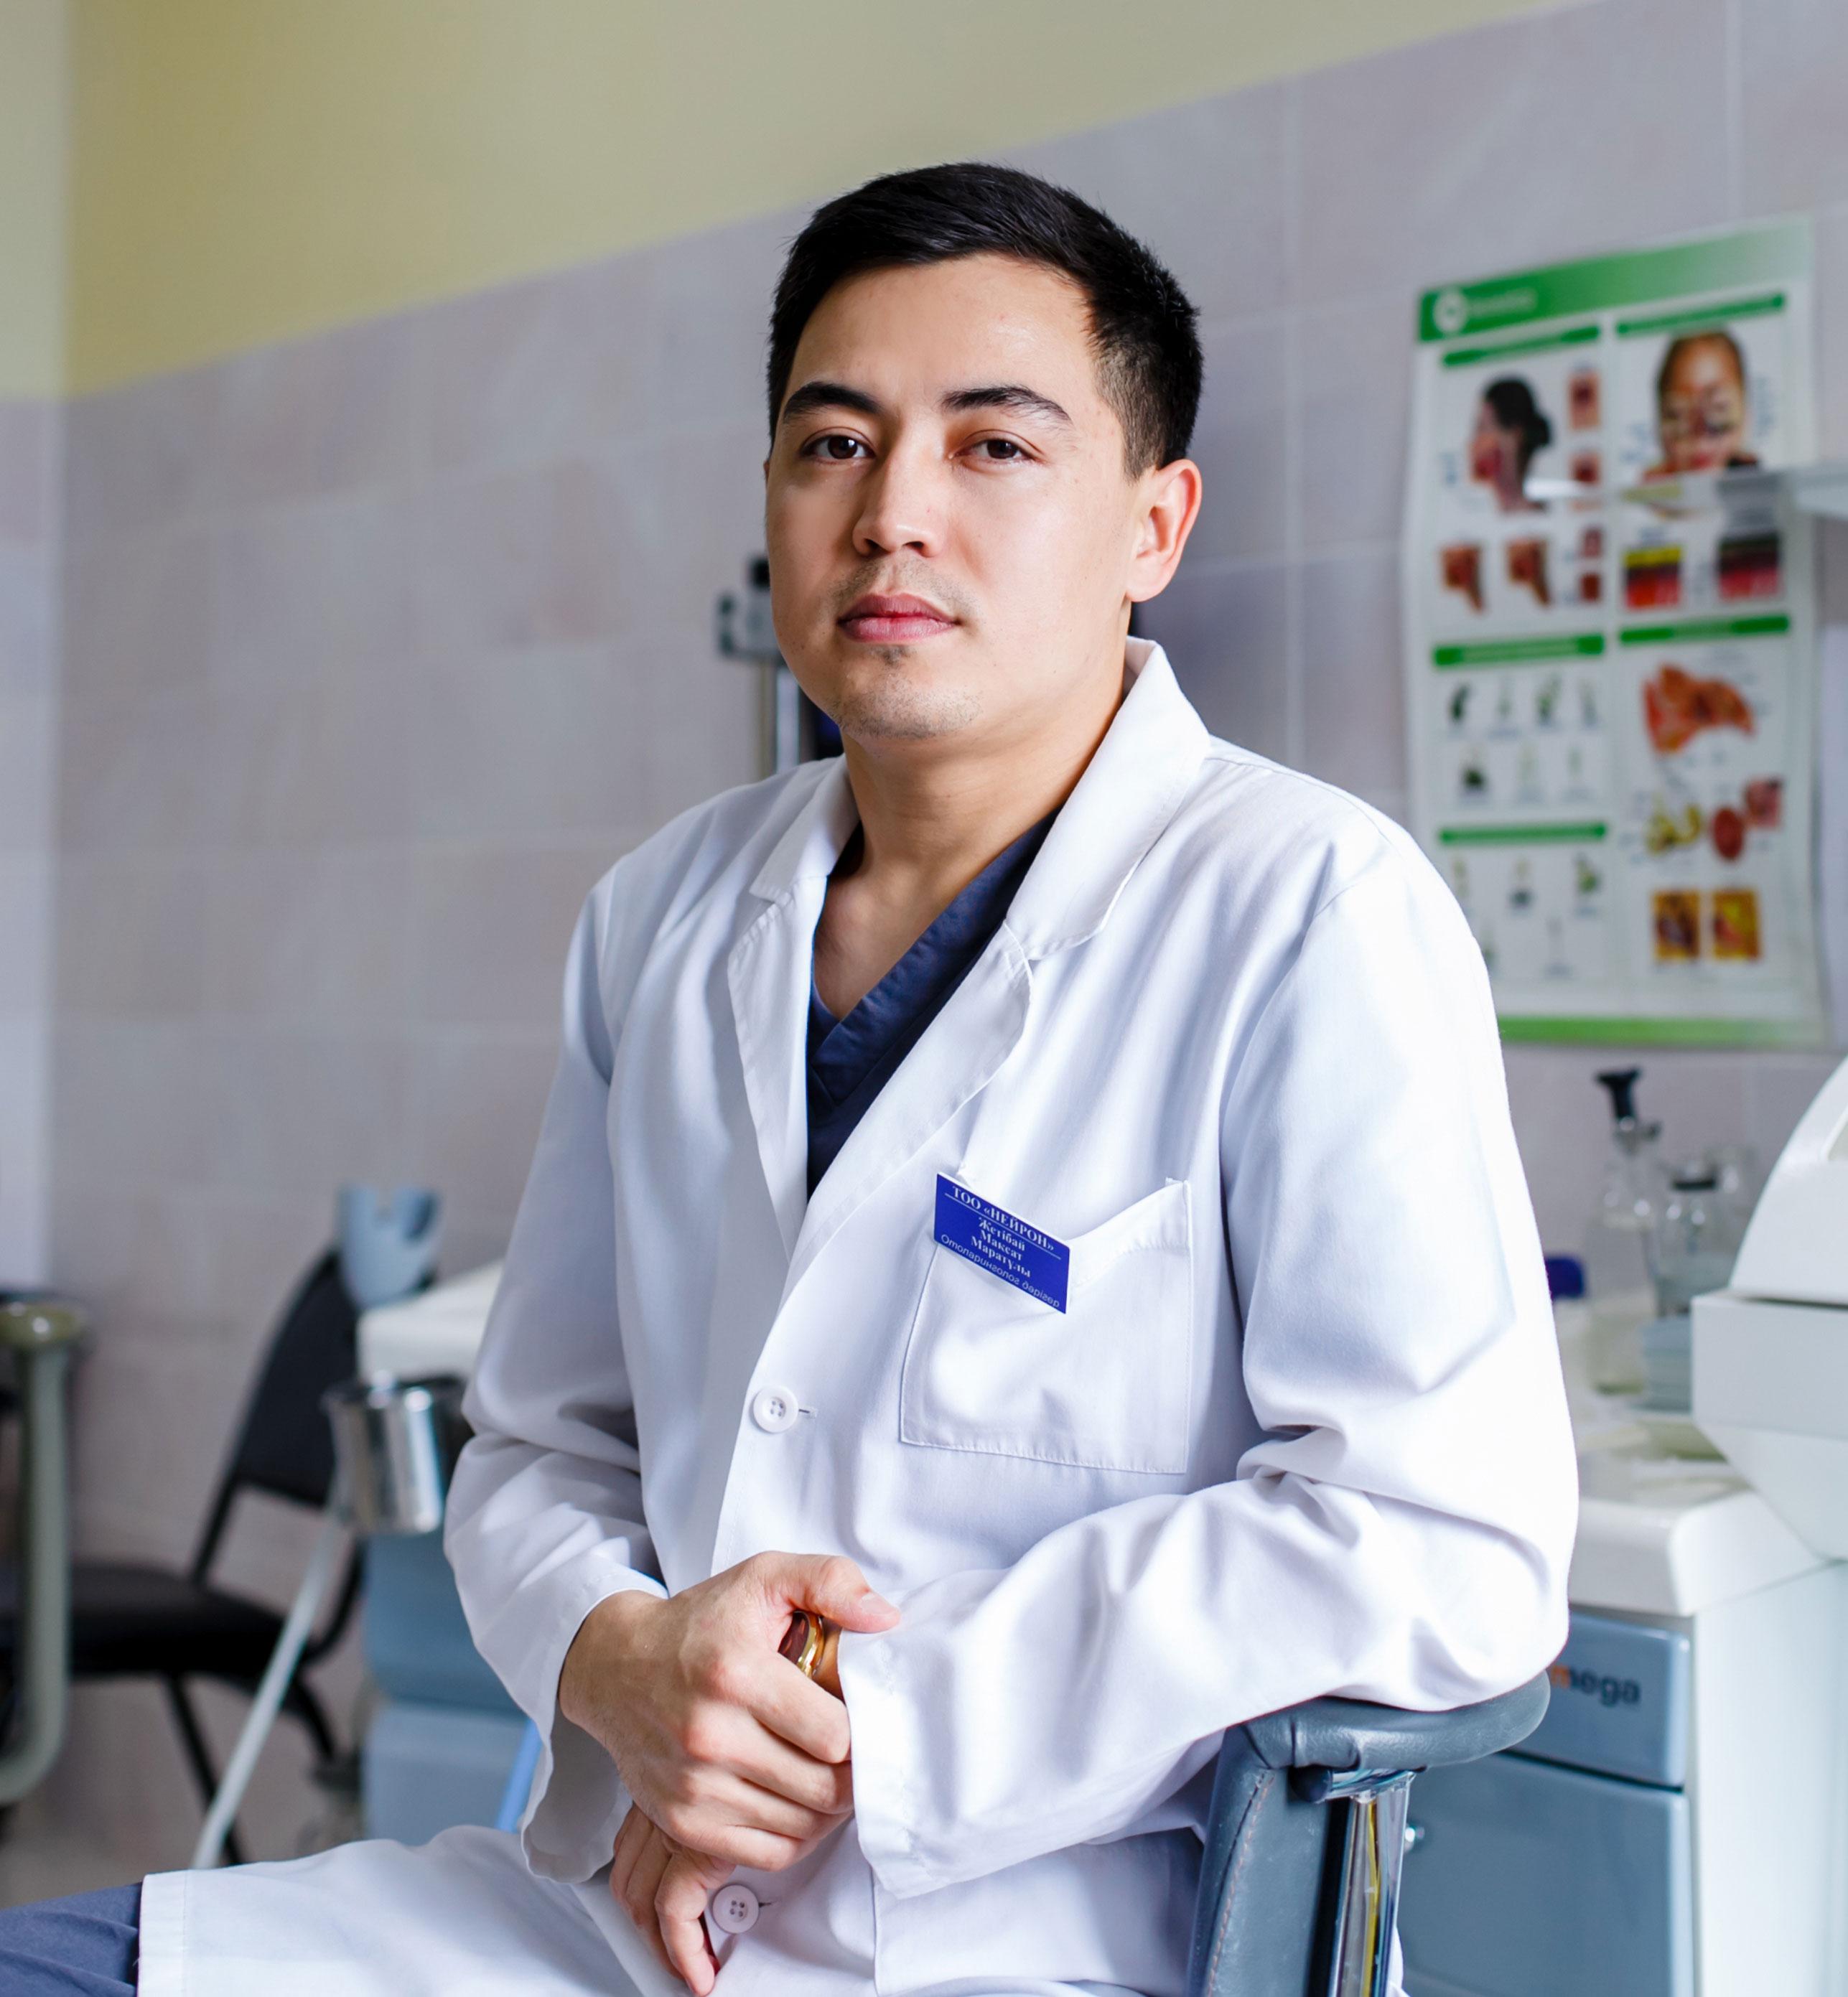 Жетибаев-Максат-Маратович---Оперирующий-ЛОР-врач